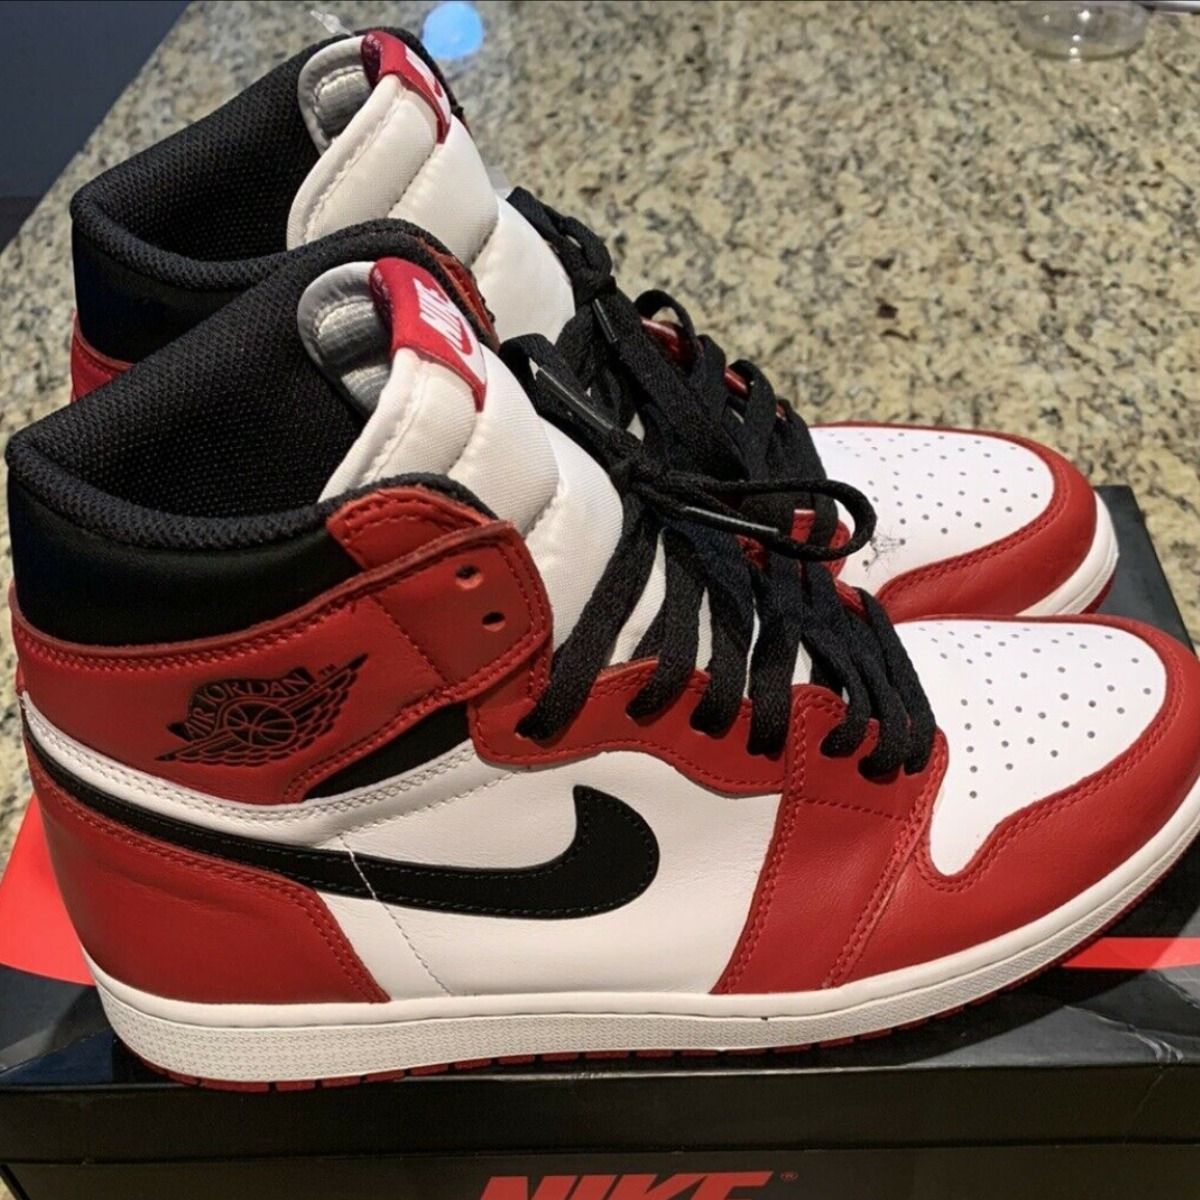 Used Nike Air Jordan 1 Retro High Og